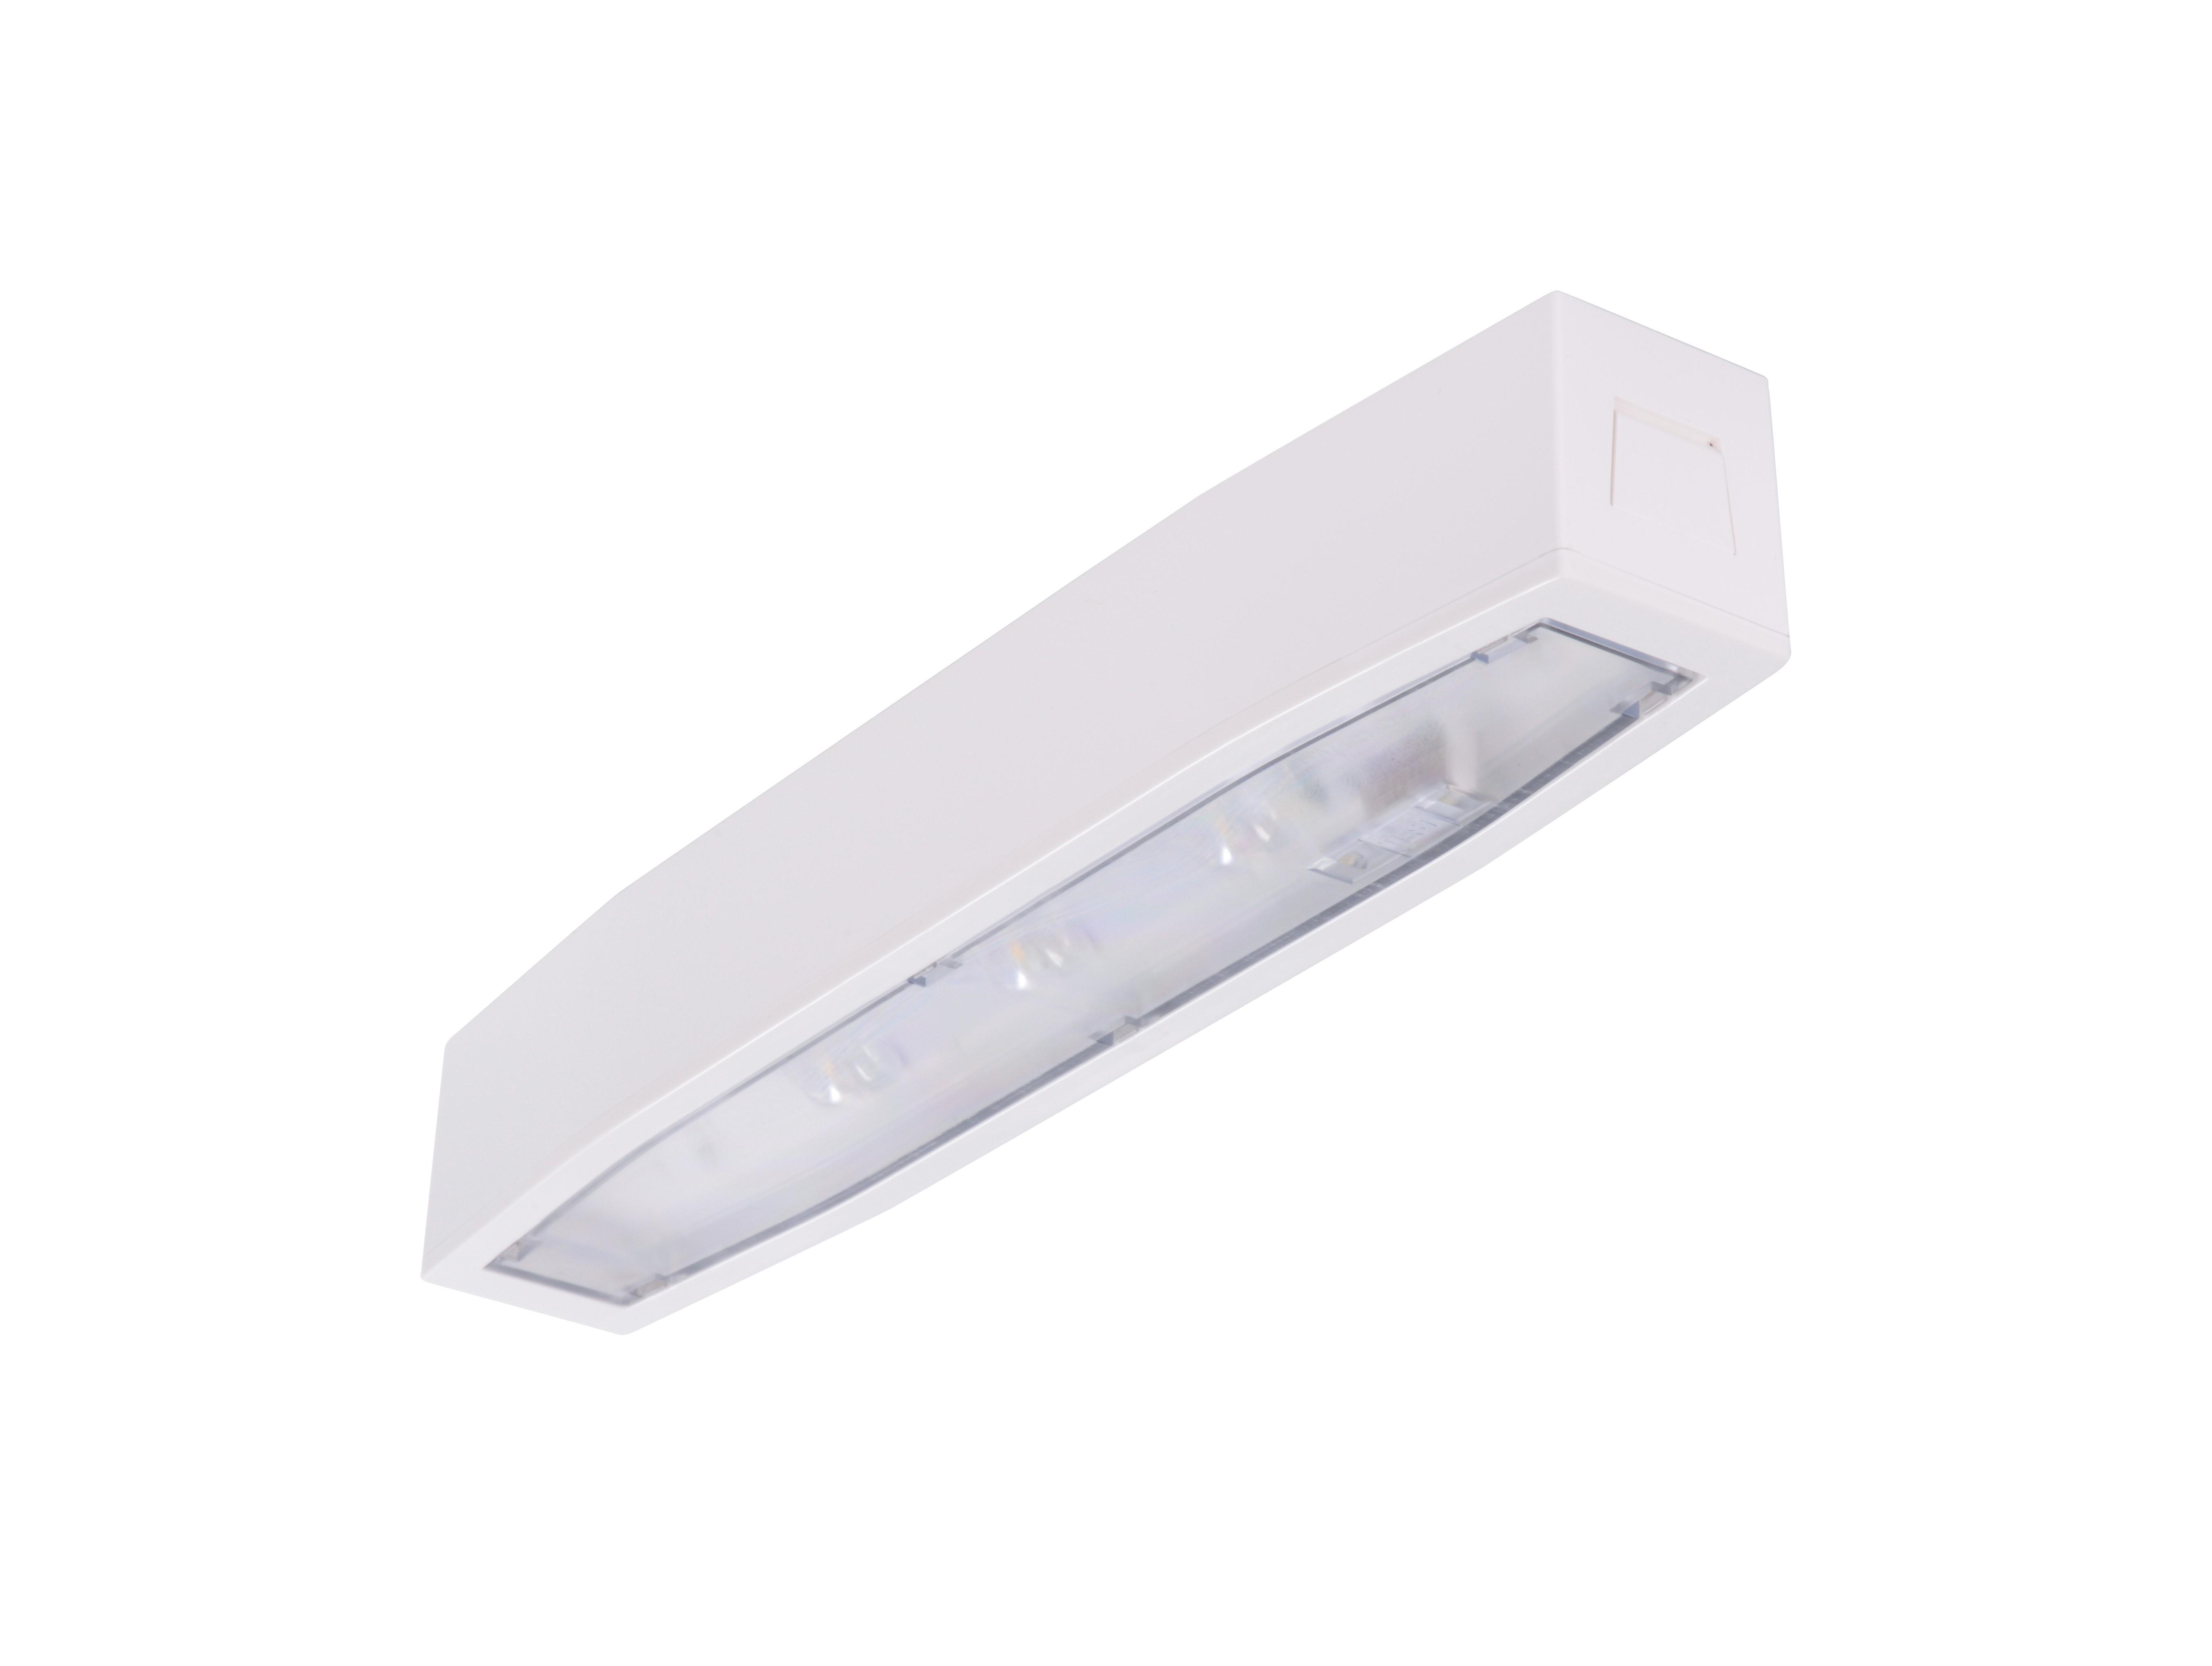 Lampa emergenta led Intelight 94771   2h nementinut test automat 0